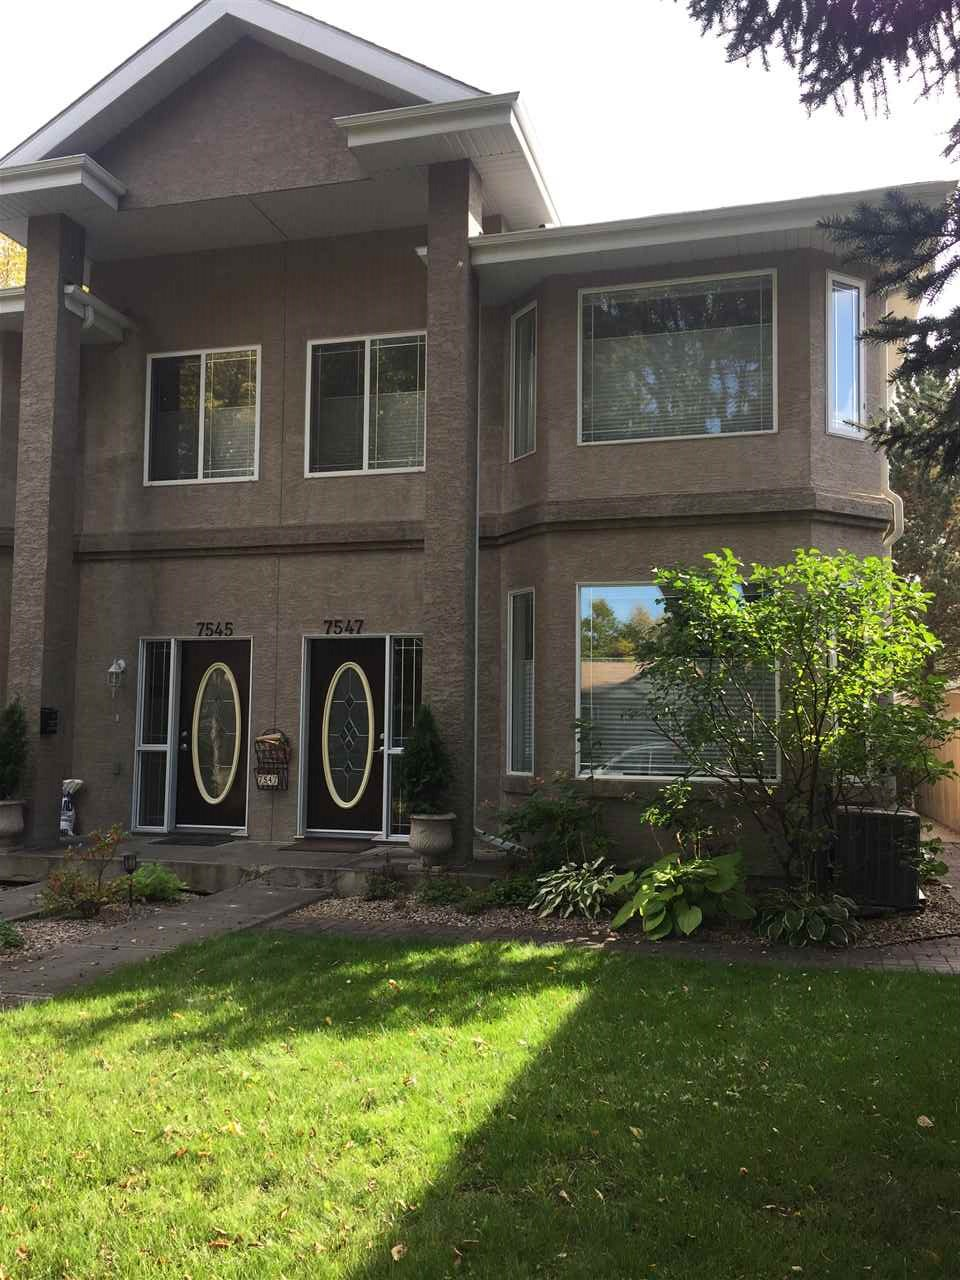 7547 80 Avenue Nw, Edmonton, MLS® # E4174107